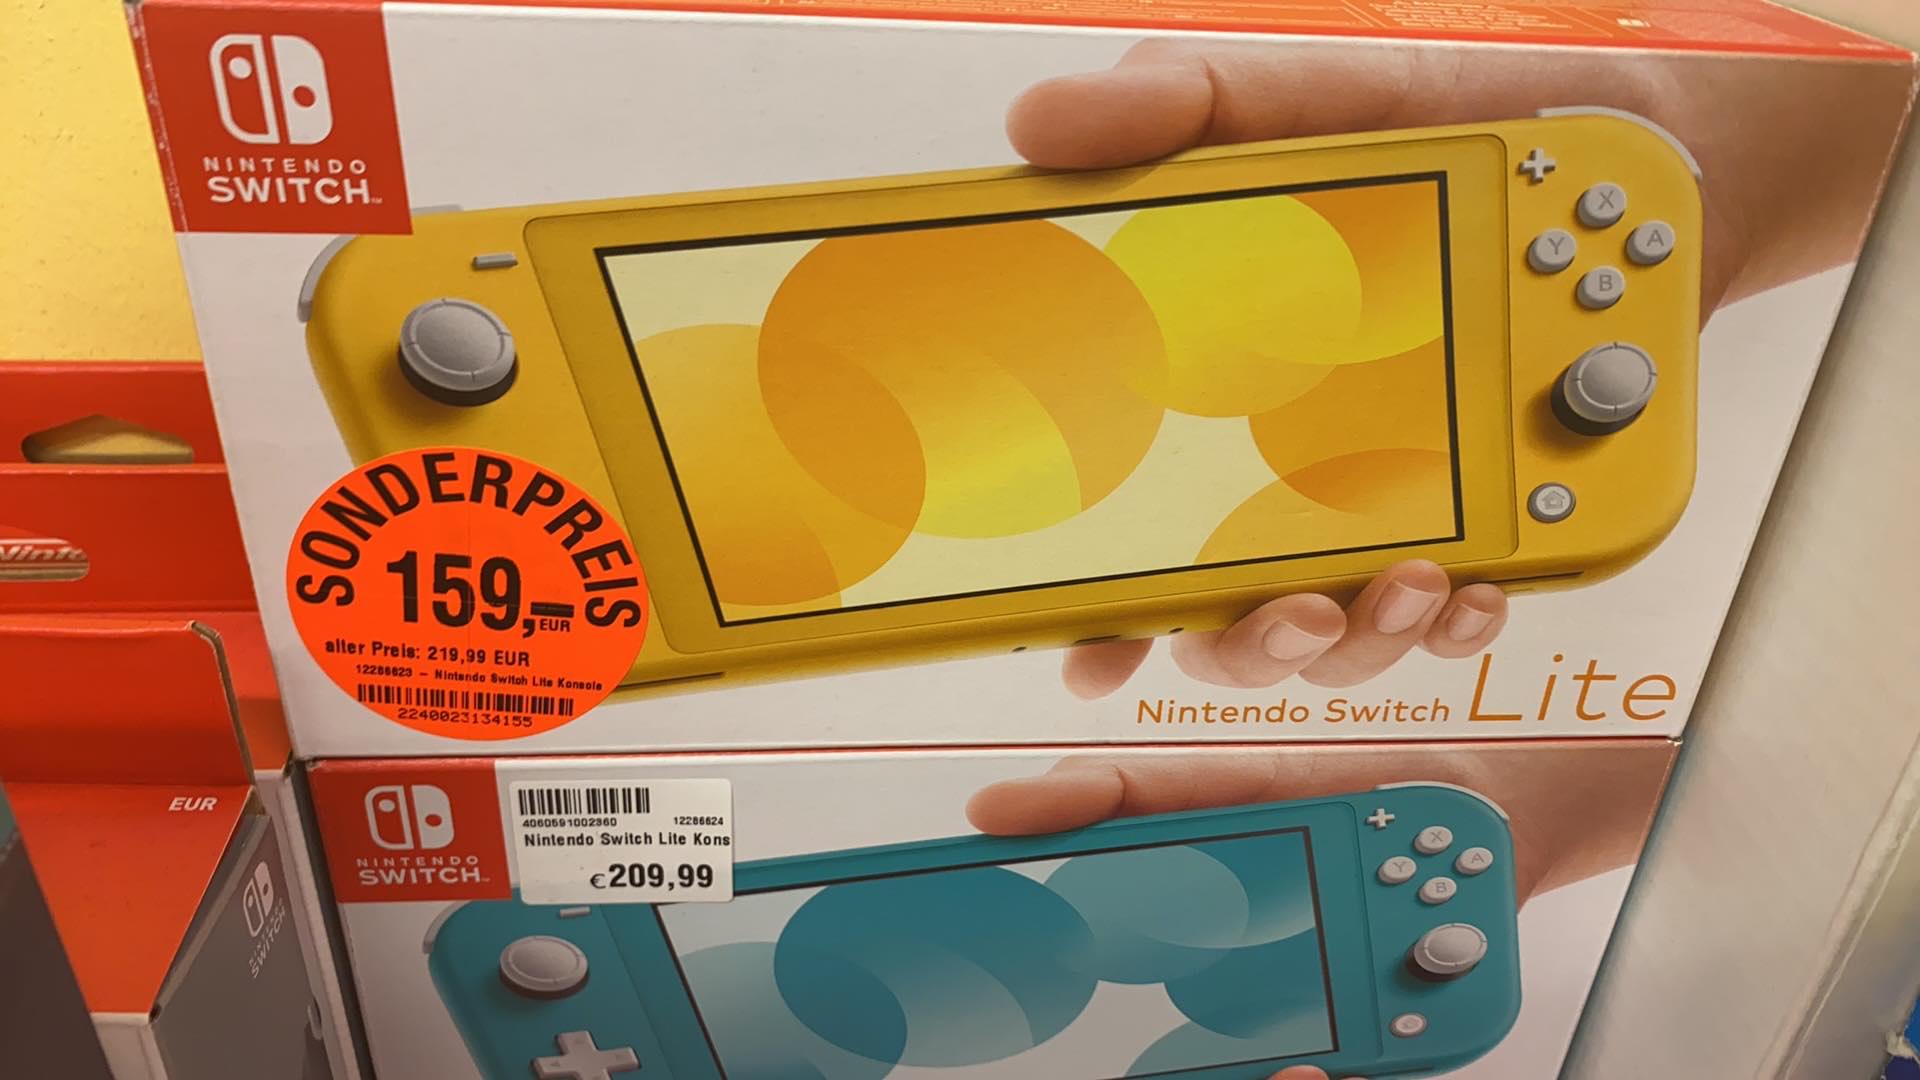 Nintendo Switch Lite - MyToys (Outlet) - ggf. nur lokal